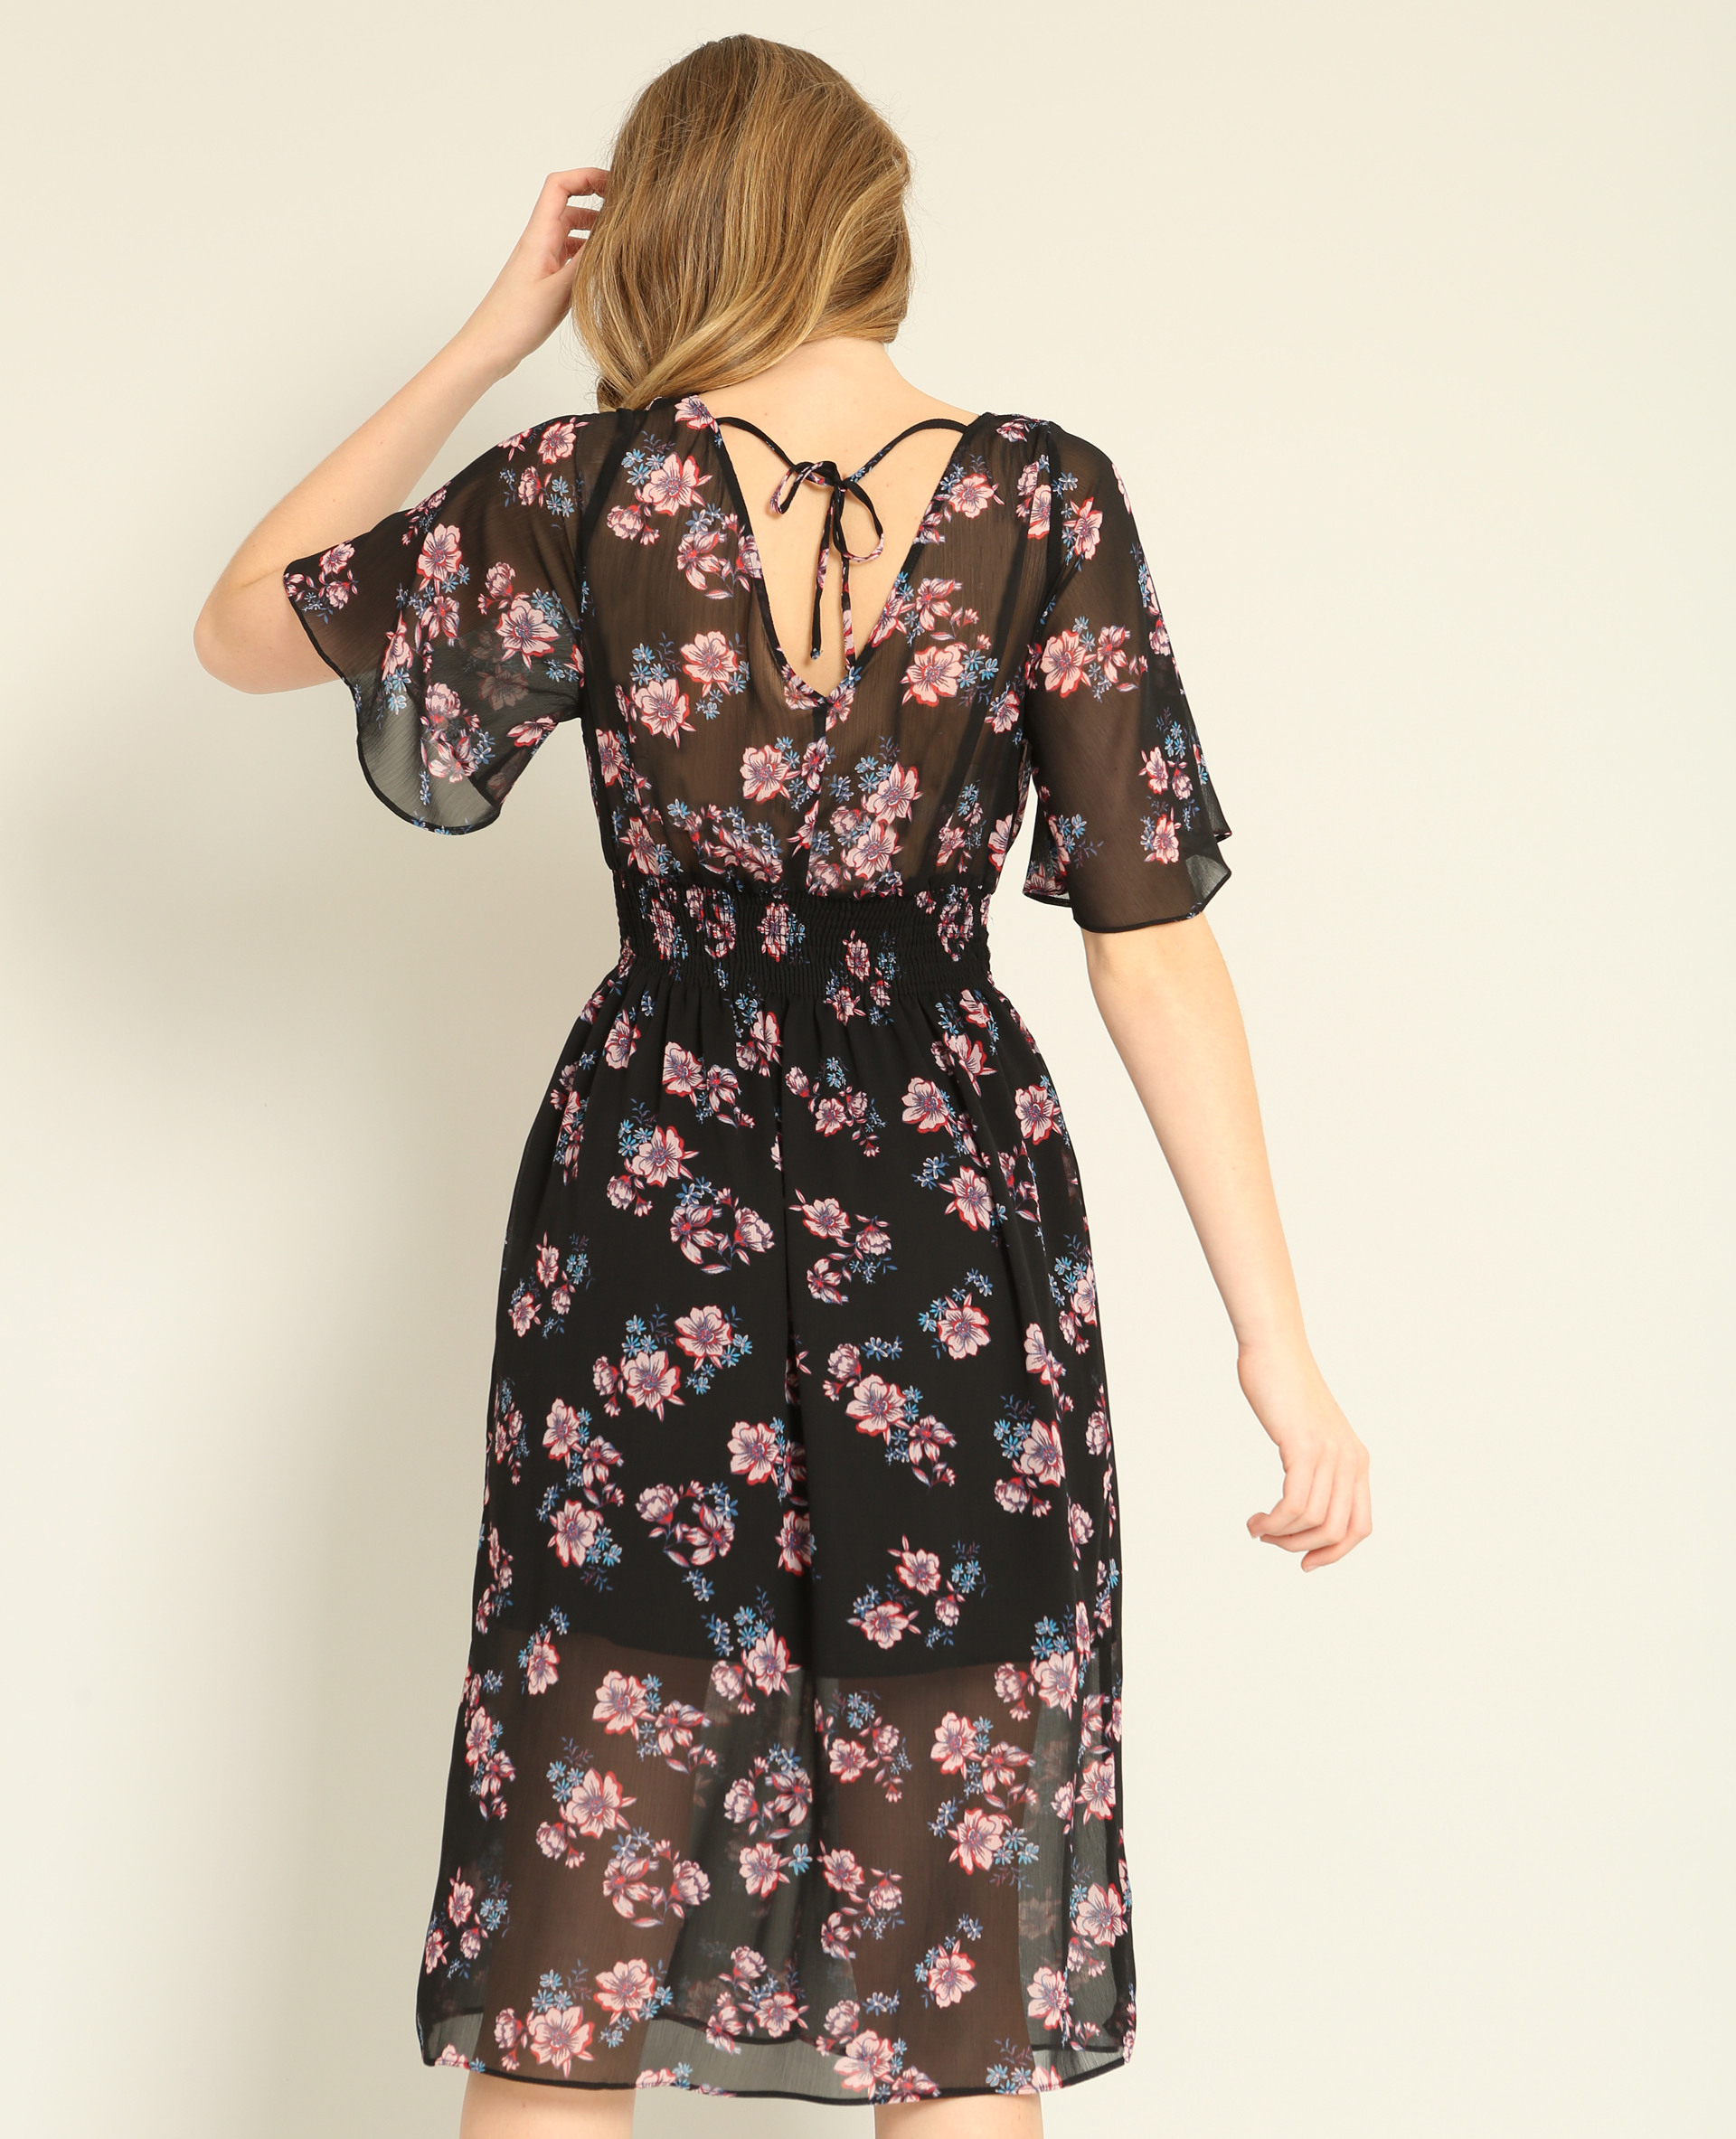 Gebluemtes Kleid Schwarz  780857899E92  Pimkie